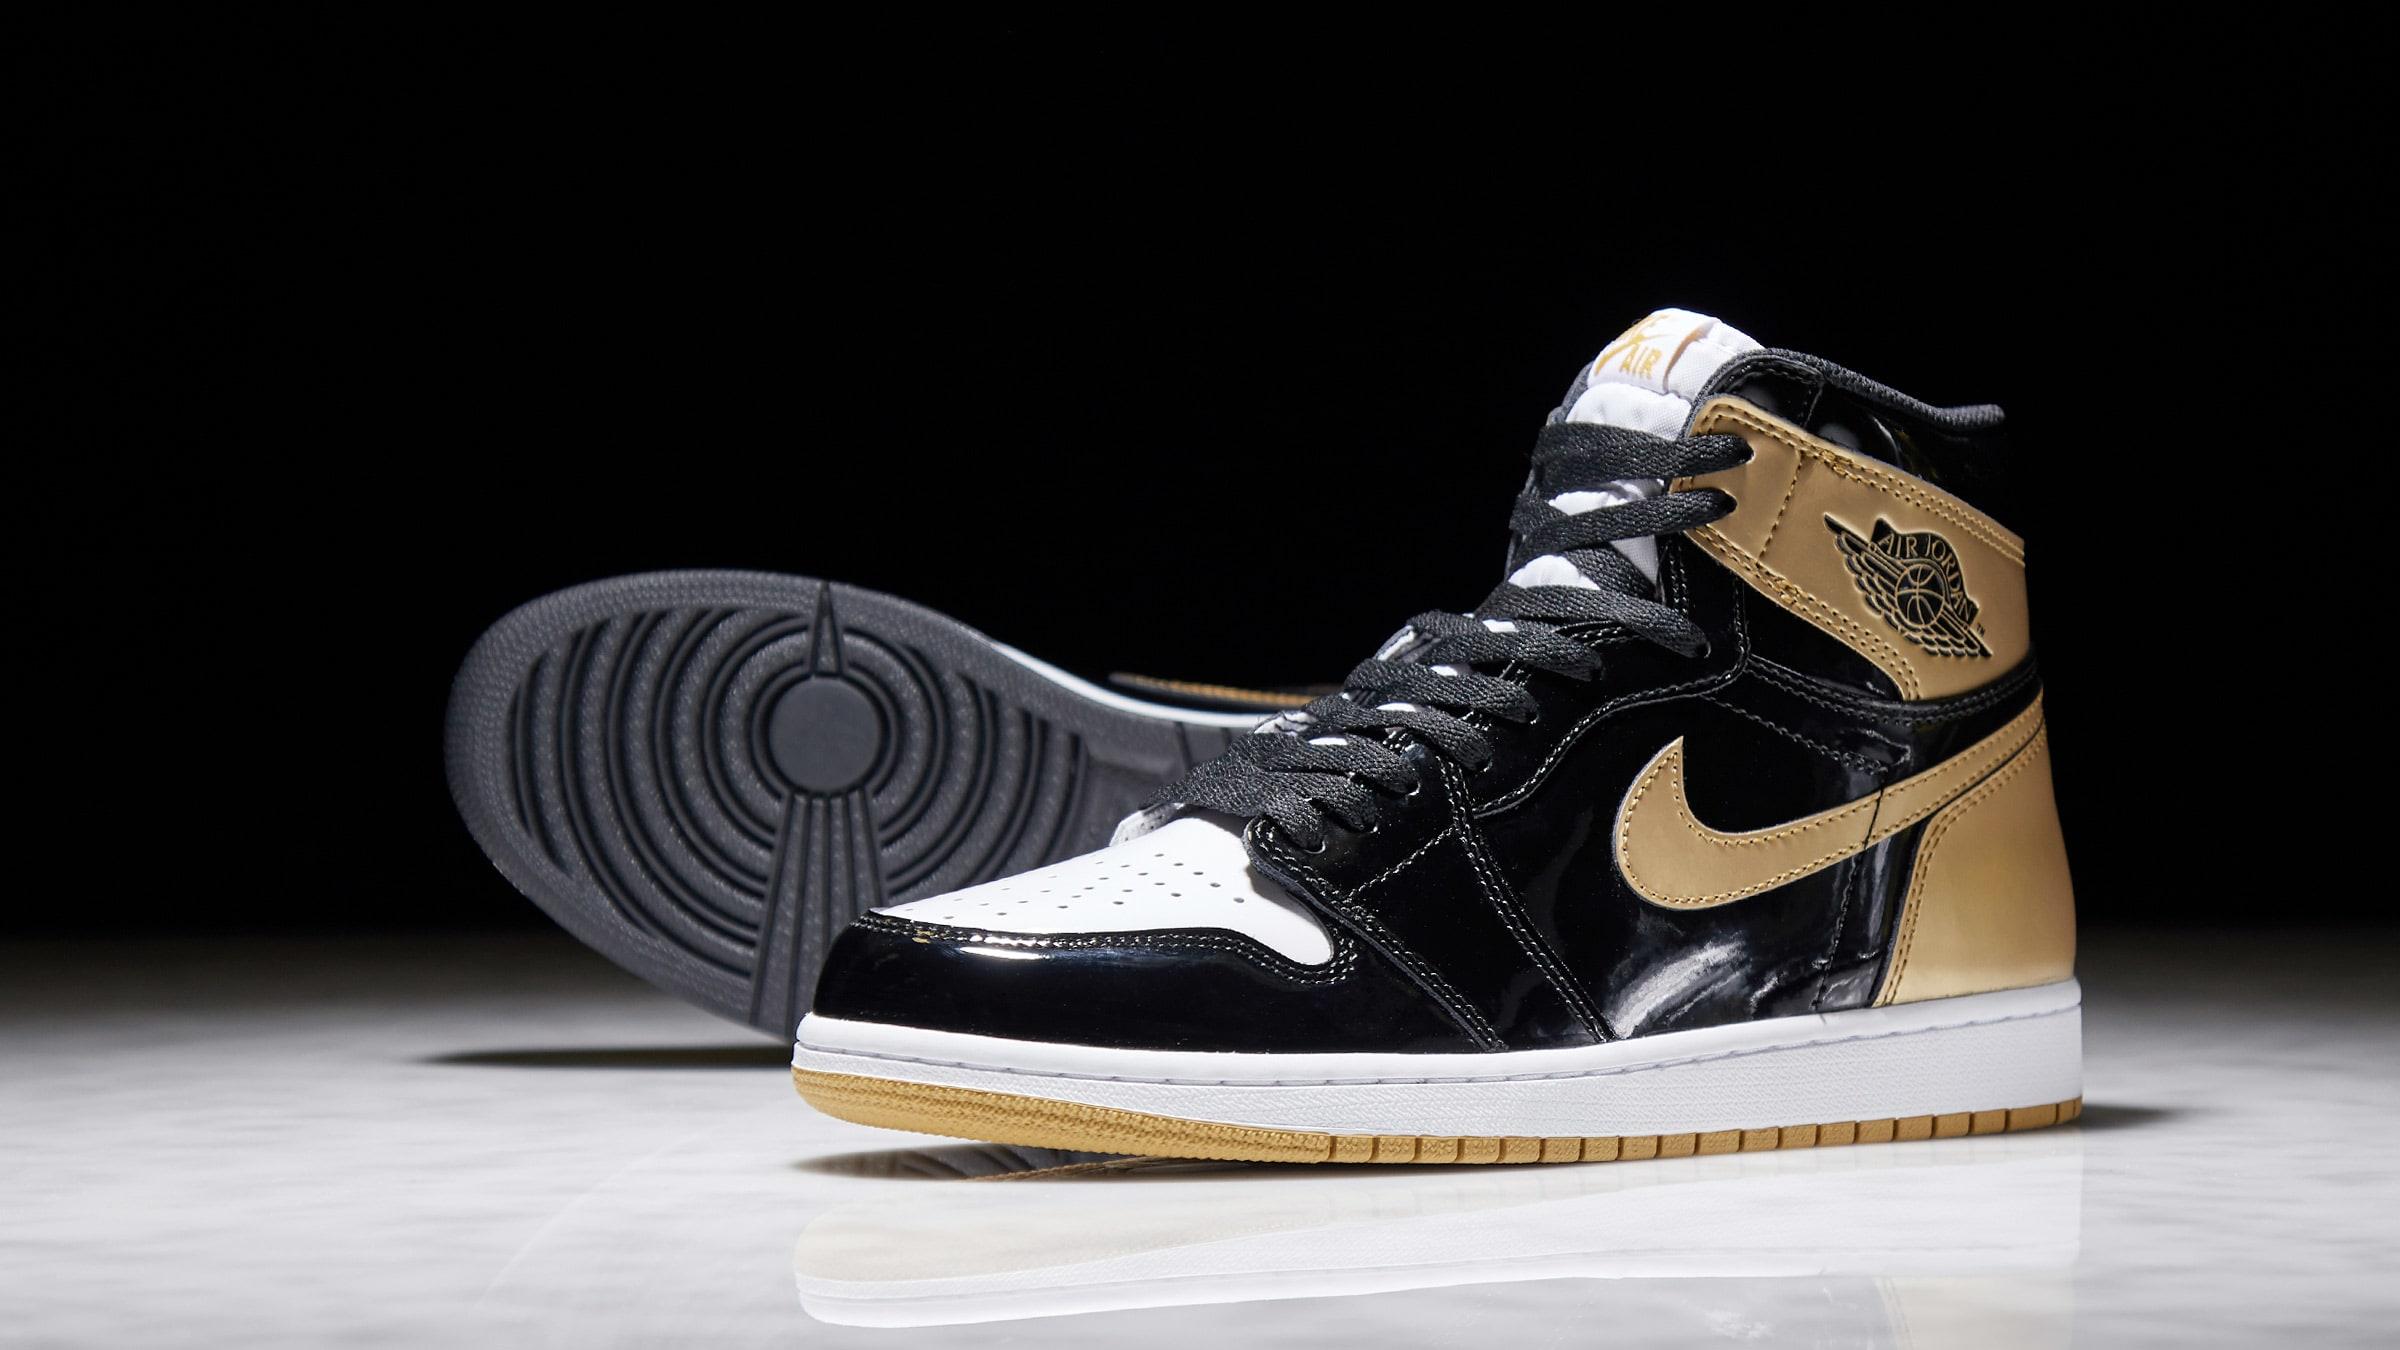 c4eb71a4d93da Nike Air Jordan 1 Retro High OG Energy  Gold Top 3  (Black ...